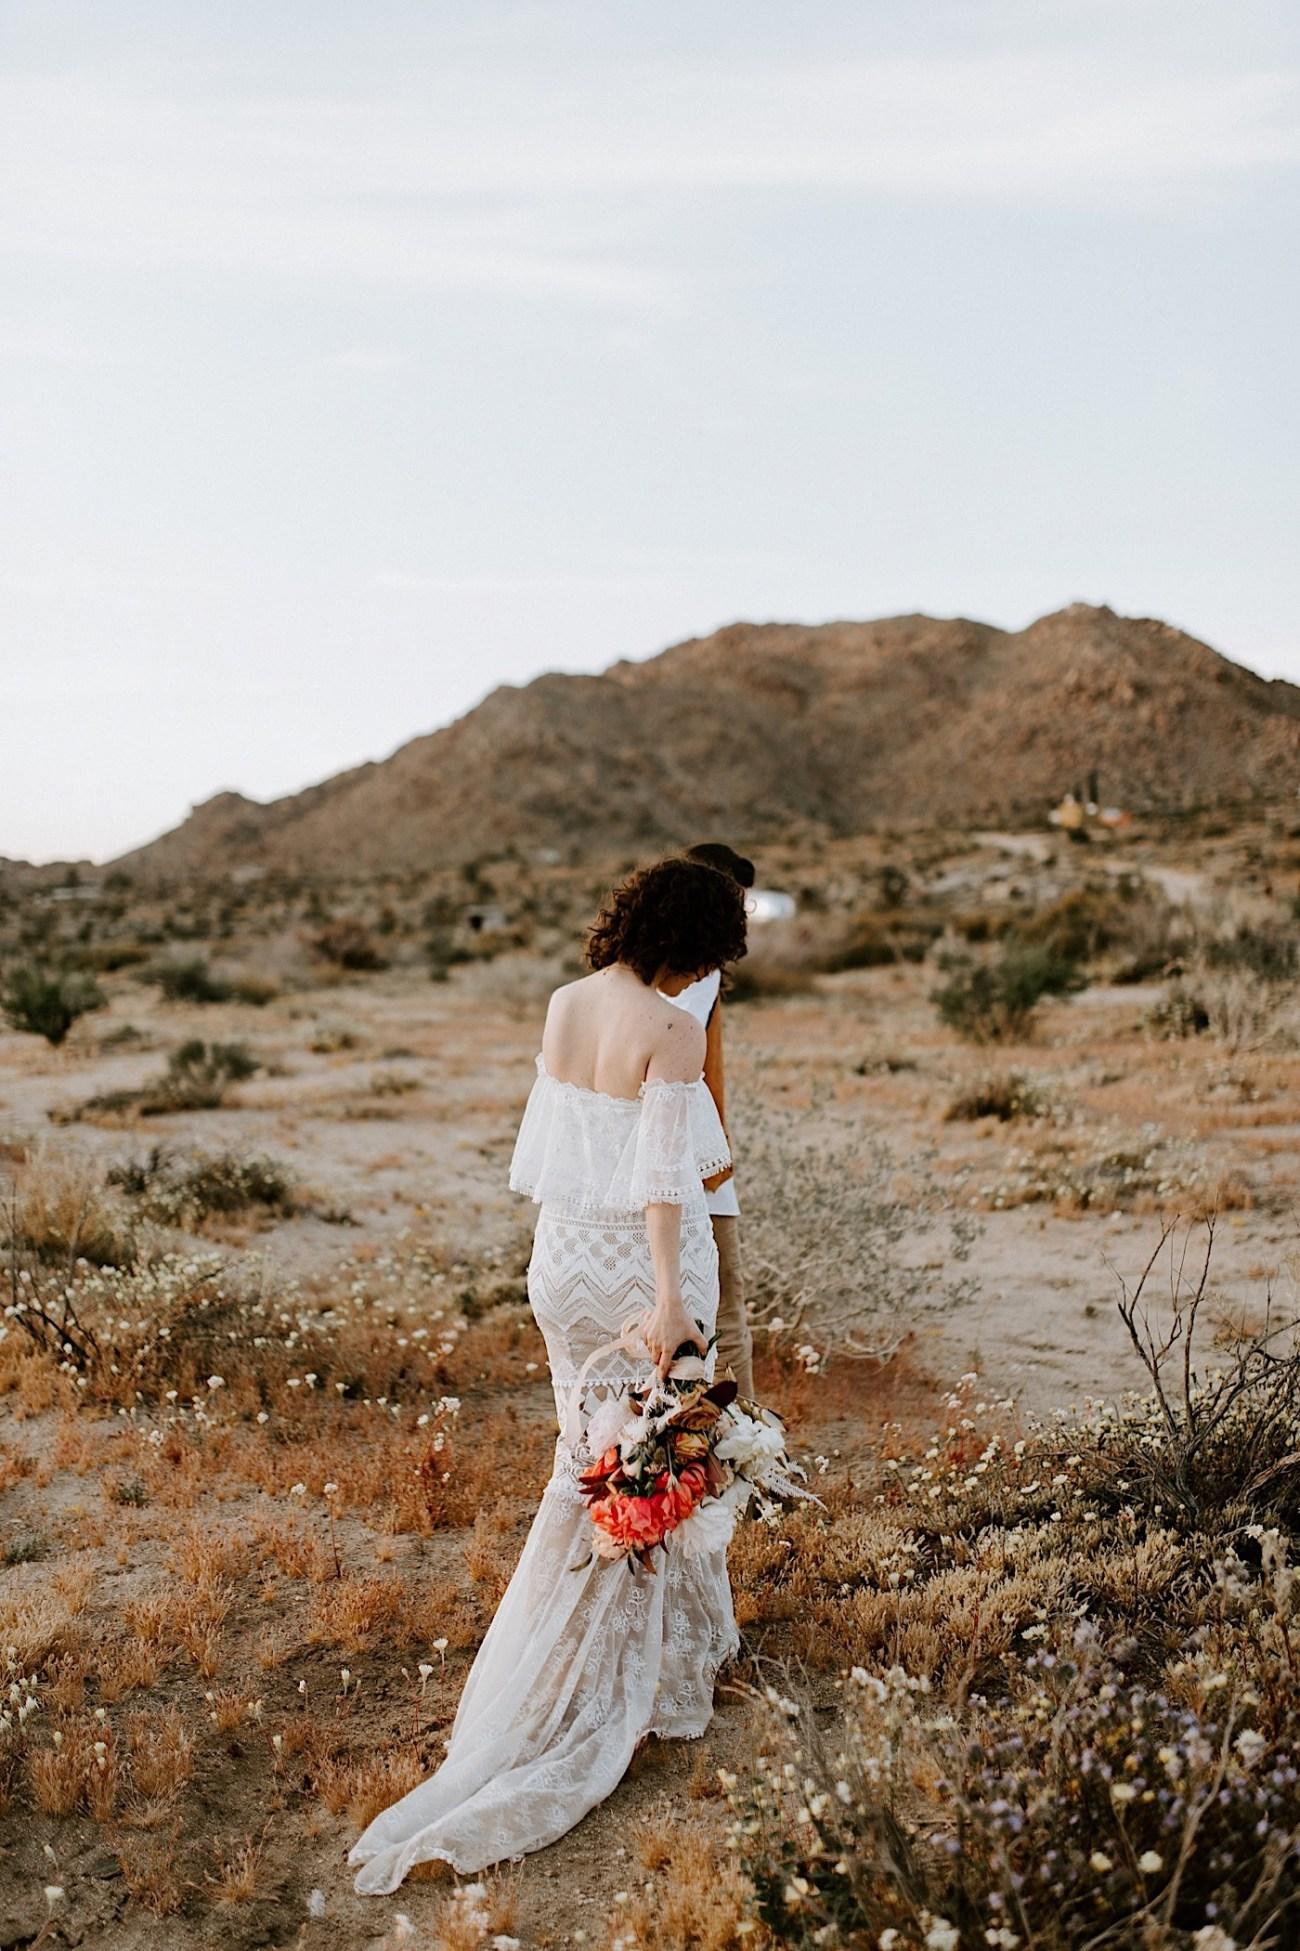 Joshua Tree Elopement, Joshua Tree Wedding Photographer, Palm Springs Wedding Photographer, Anais Possamai Photography